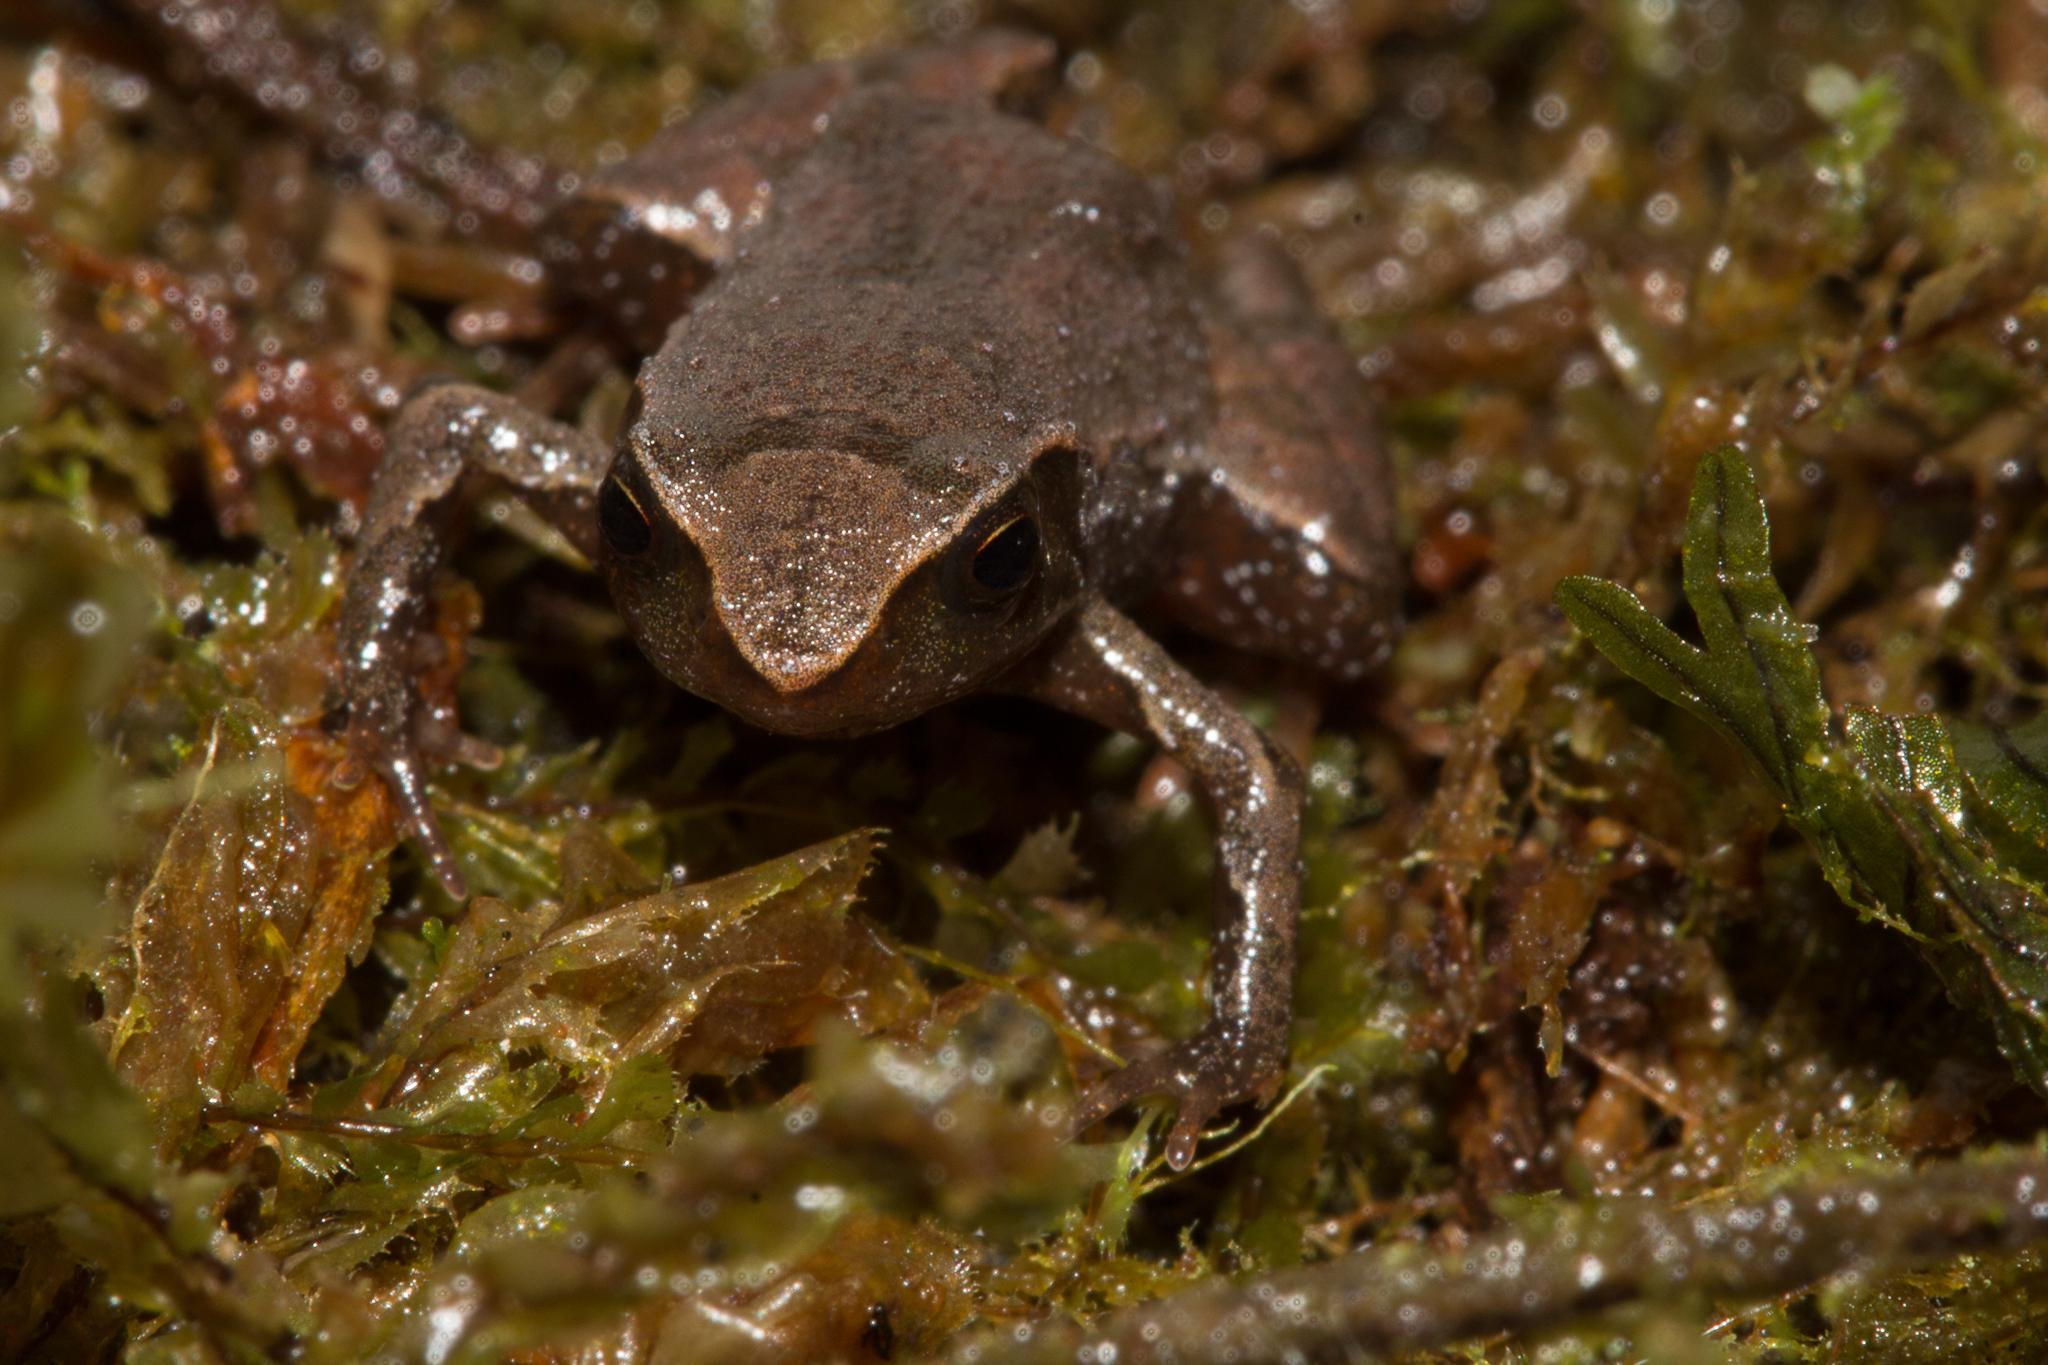 A new species of terrestrial terrarana frog in the genus Noblella, collected near Camp 4. Photo by Santiago Castroviejo